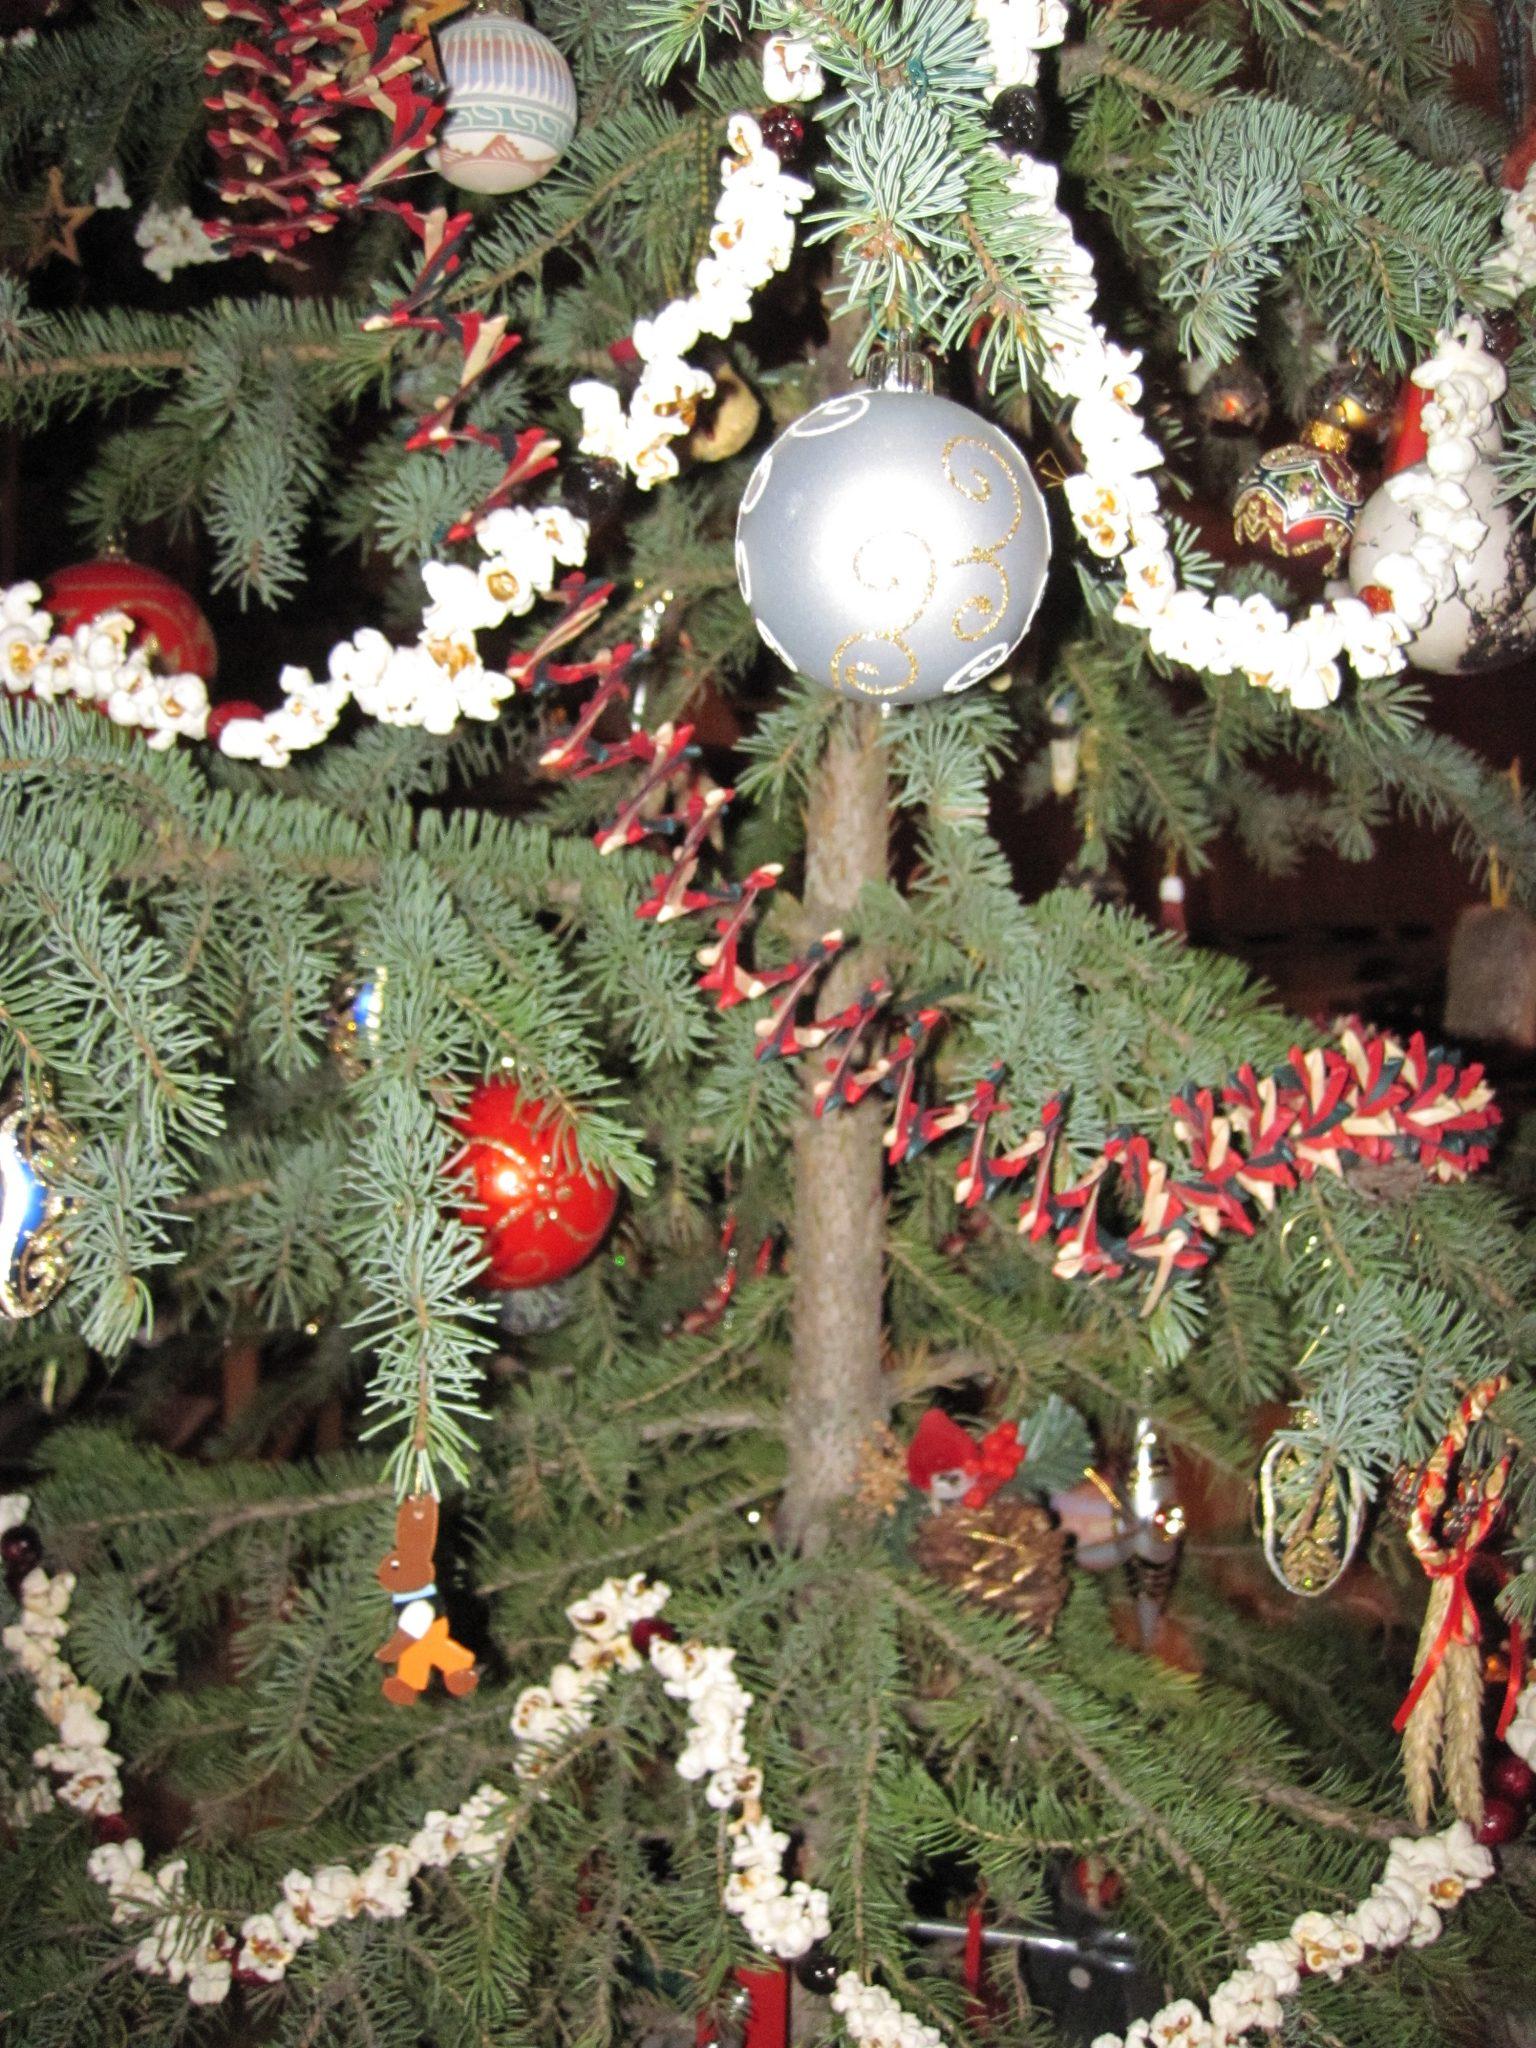 Recipe: Zesty Meatballs for Christmas